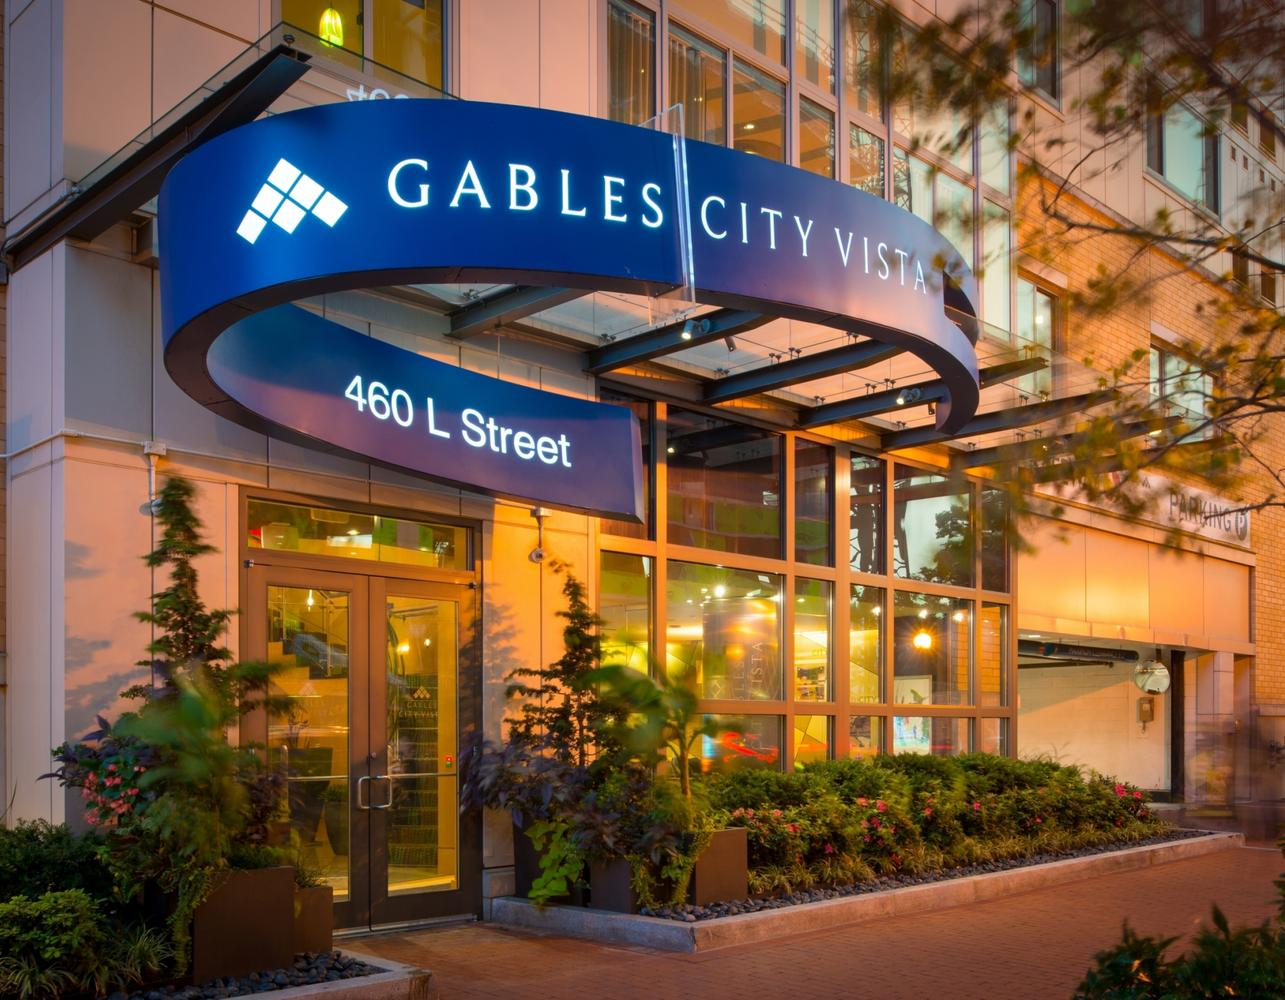 Gables City Vista   Gables Residential Communities